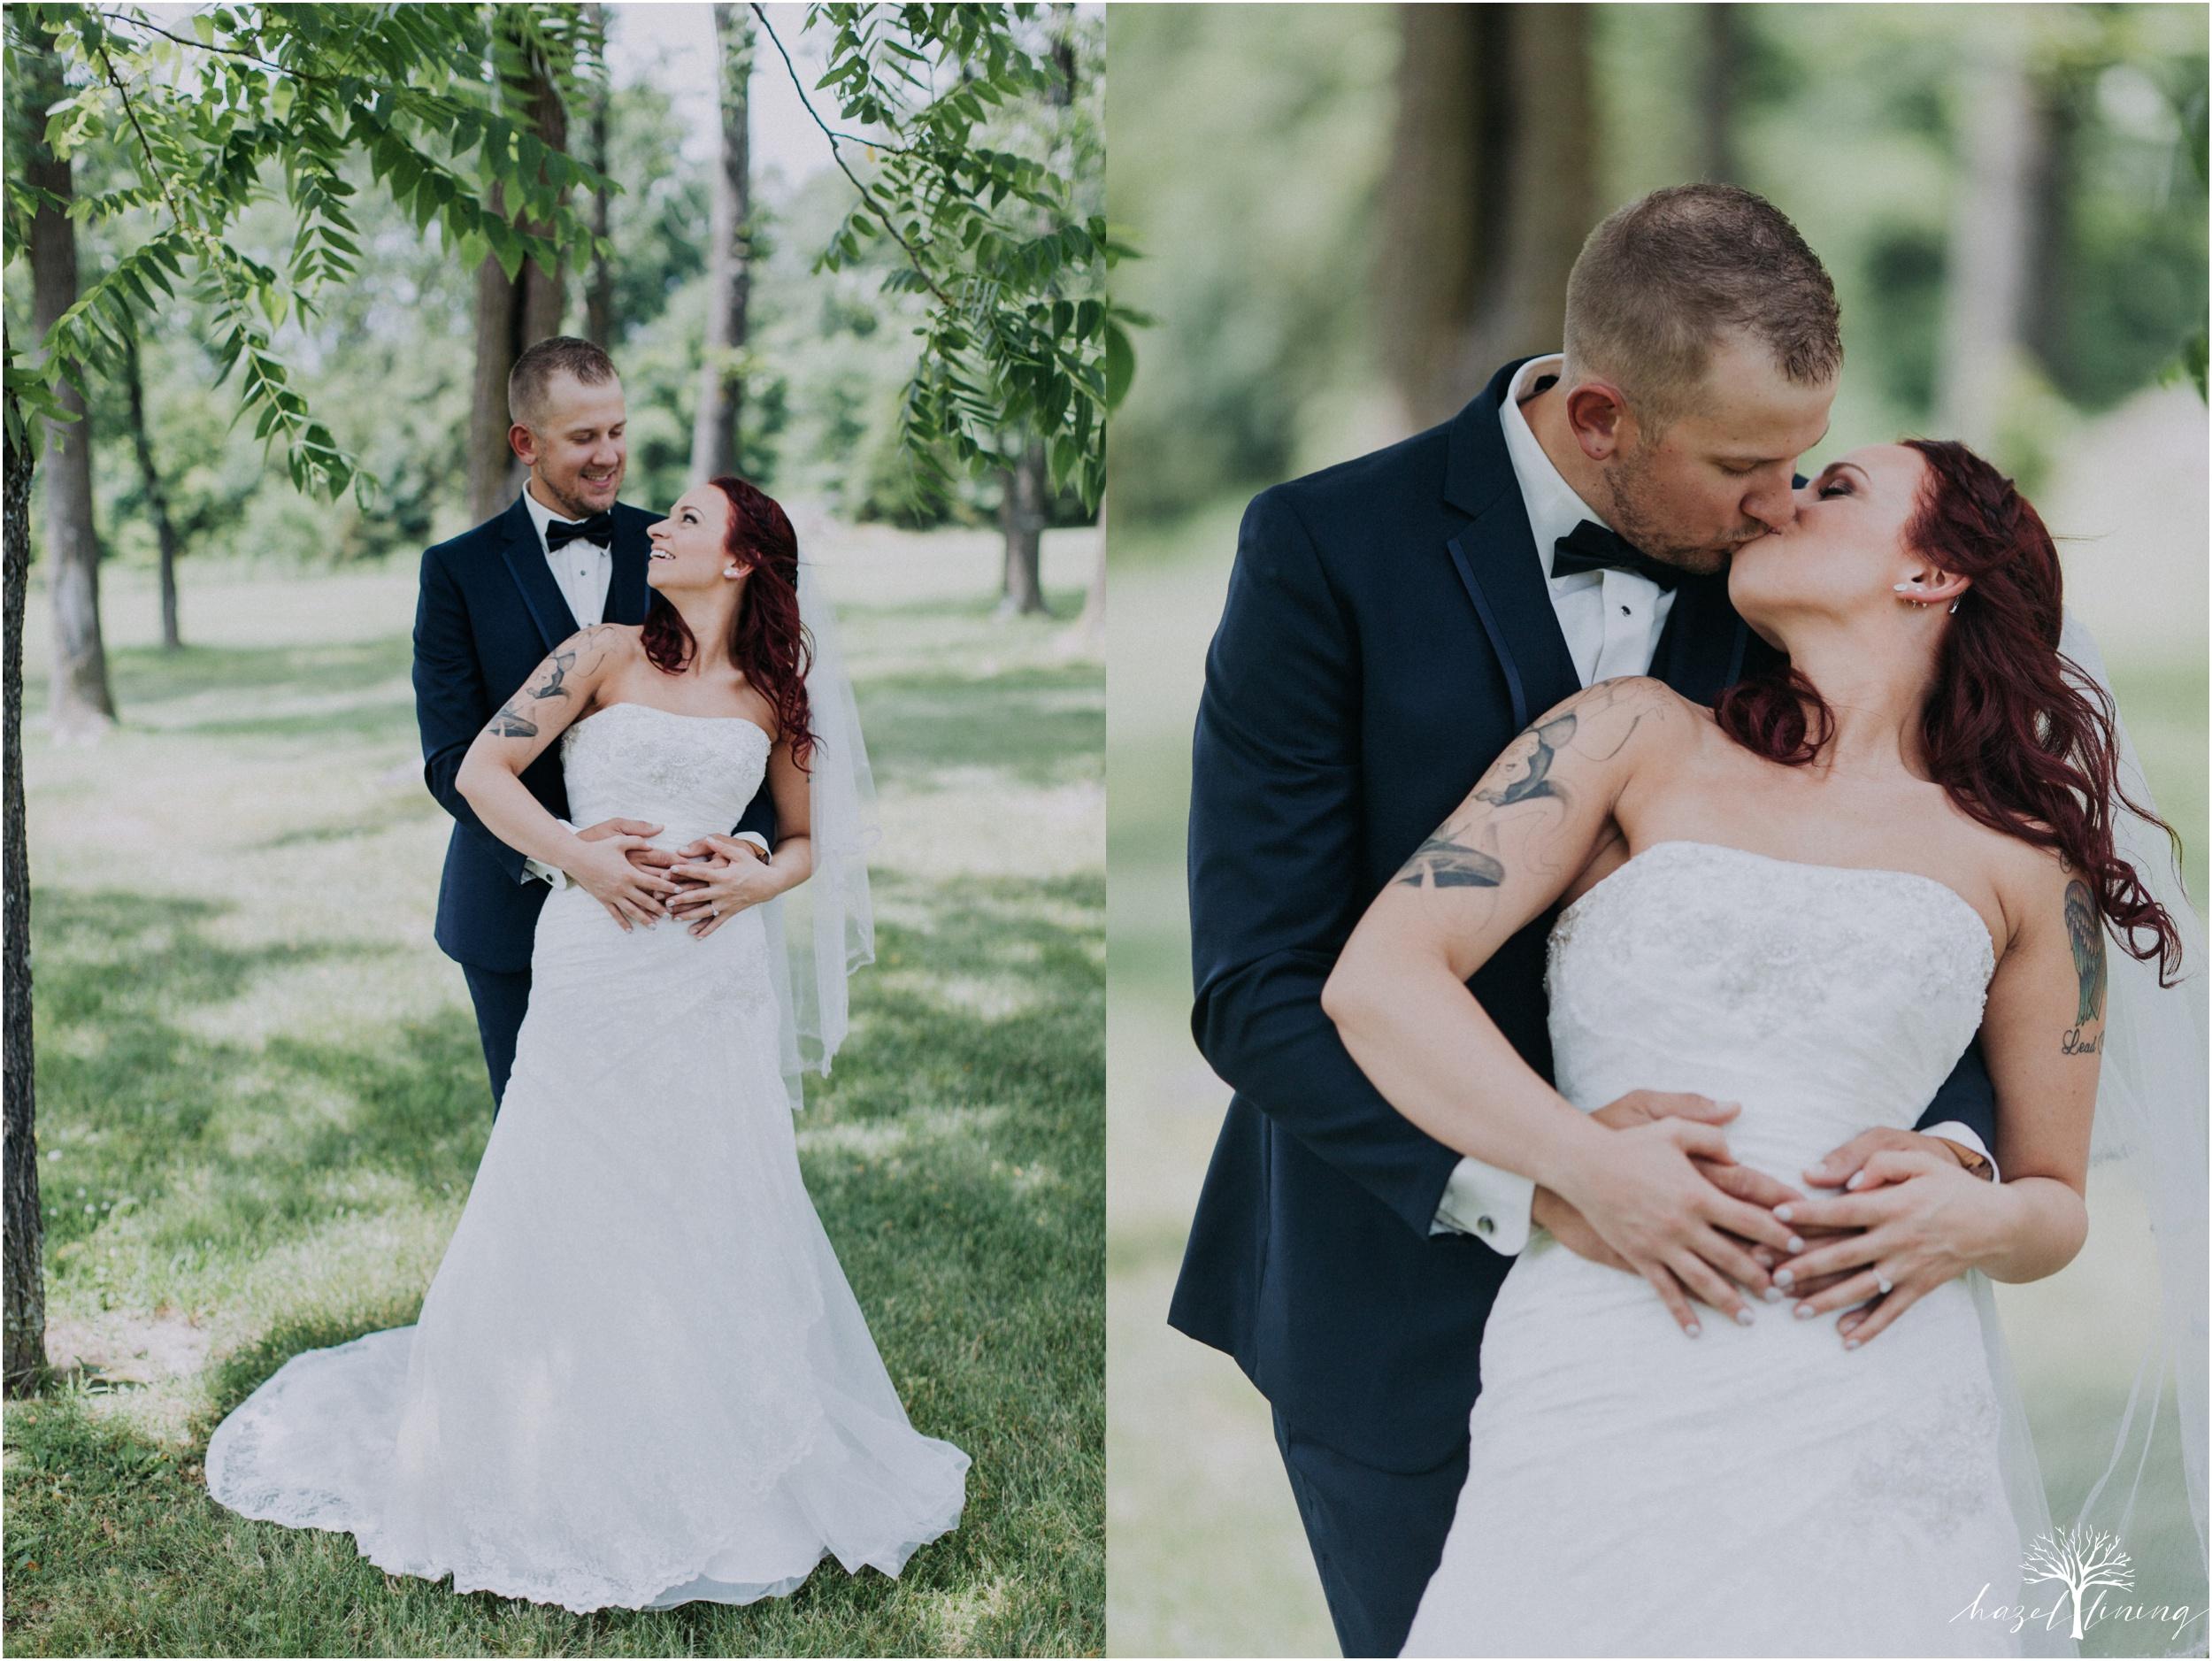 alyssa-james-stiteler-wedding-loft-and-sweet-water-cc-pennsburg-pennsylvania-hazel-lining-travel-wedding-elopement-photography_0035.jpg